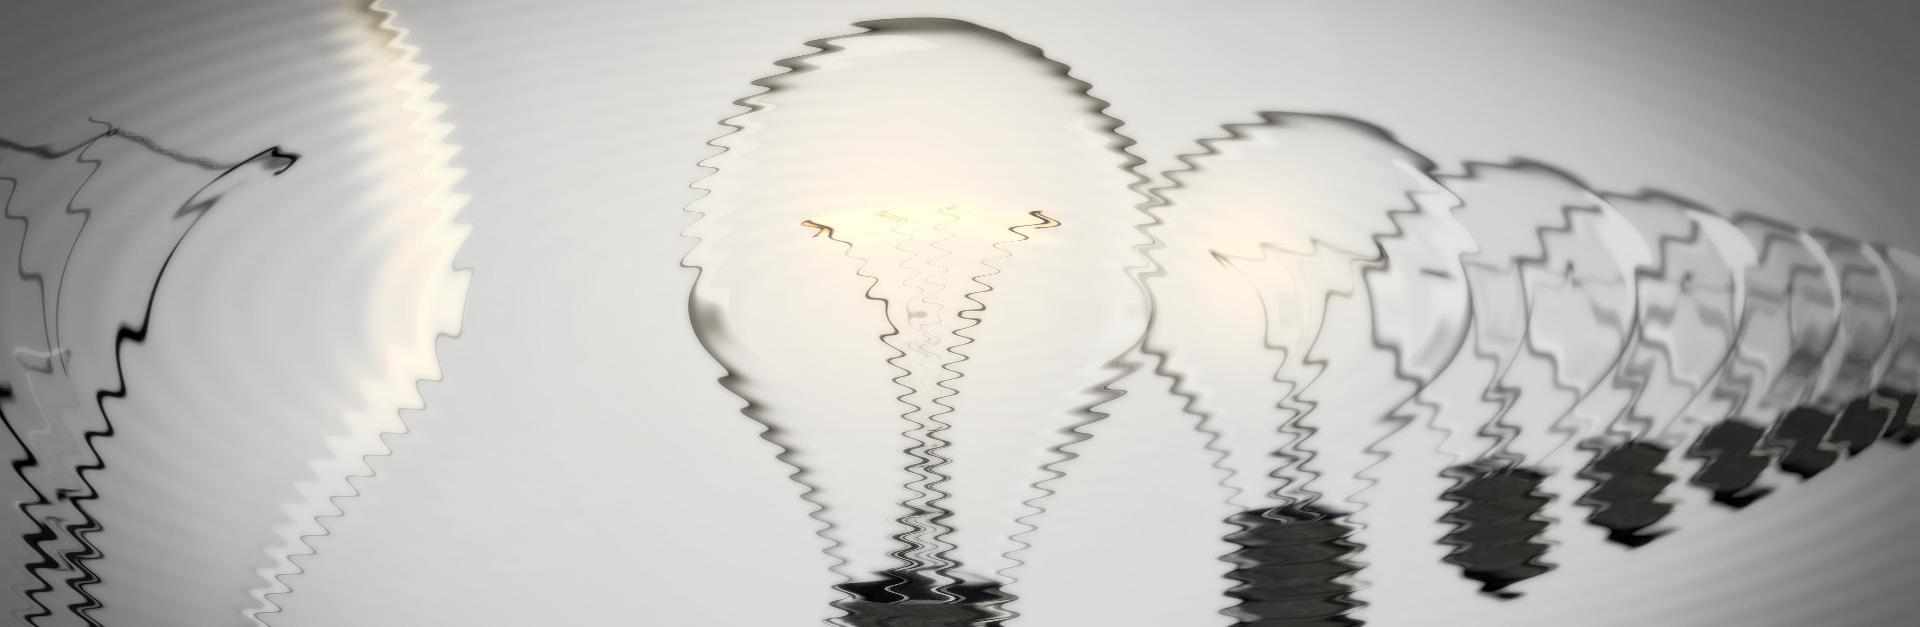 Novel Attack Technique Uses Smart Light Bulbs to Steal Data